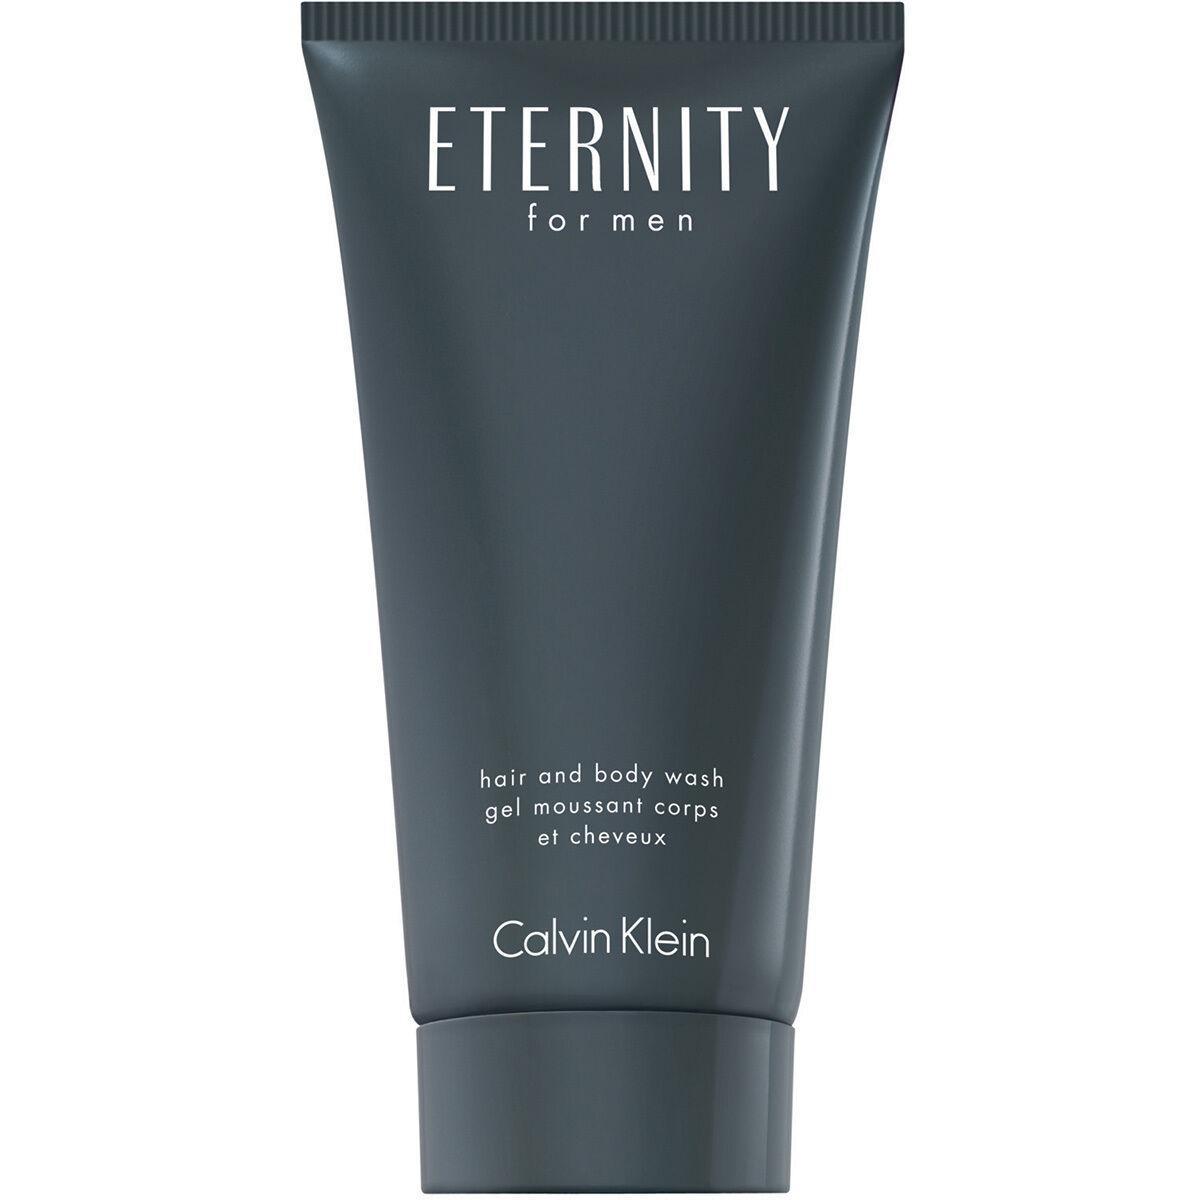 CALVIN KLEIN Eternity For Men (Кельвін Кляйн Этернити Фо Мен) гель для душа - 150мл